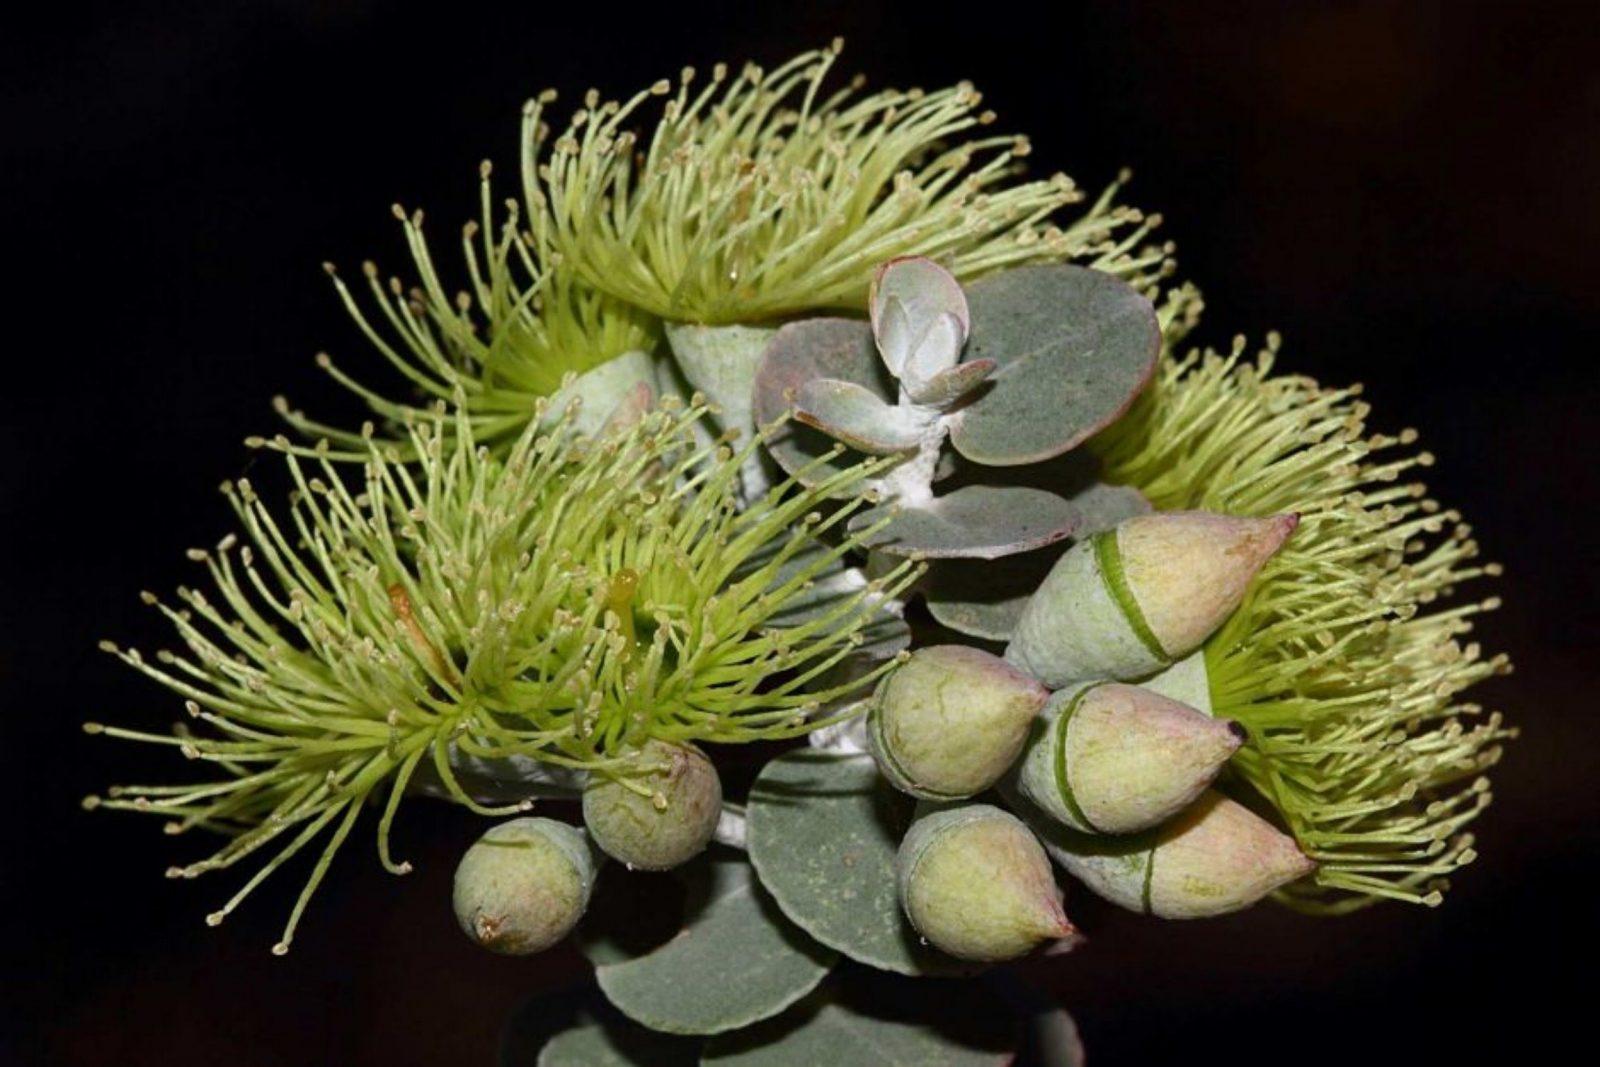 WA Herbarium, Perth, Western Australia